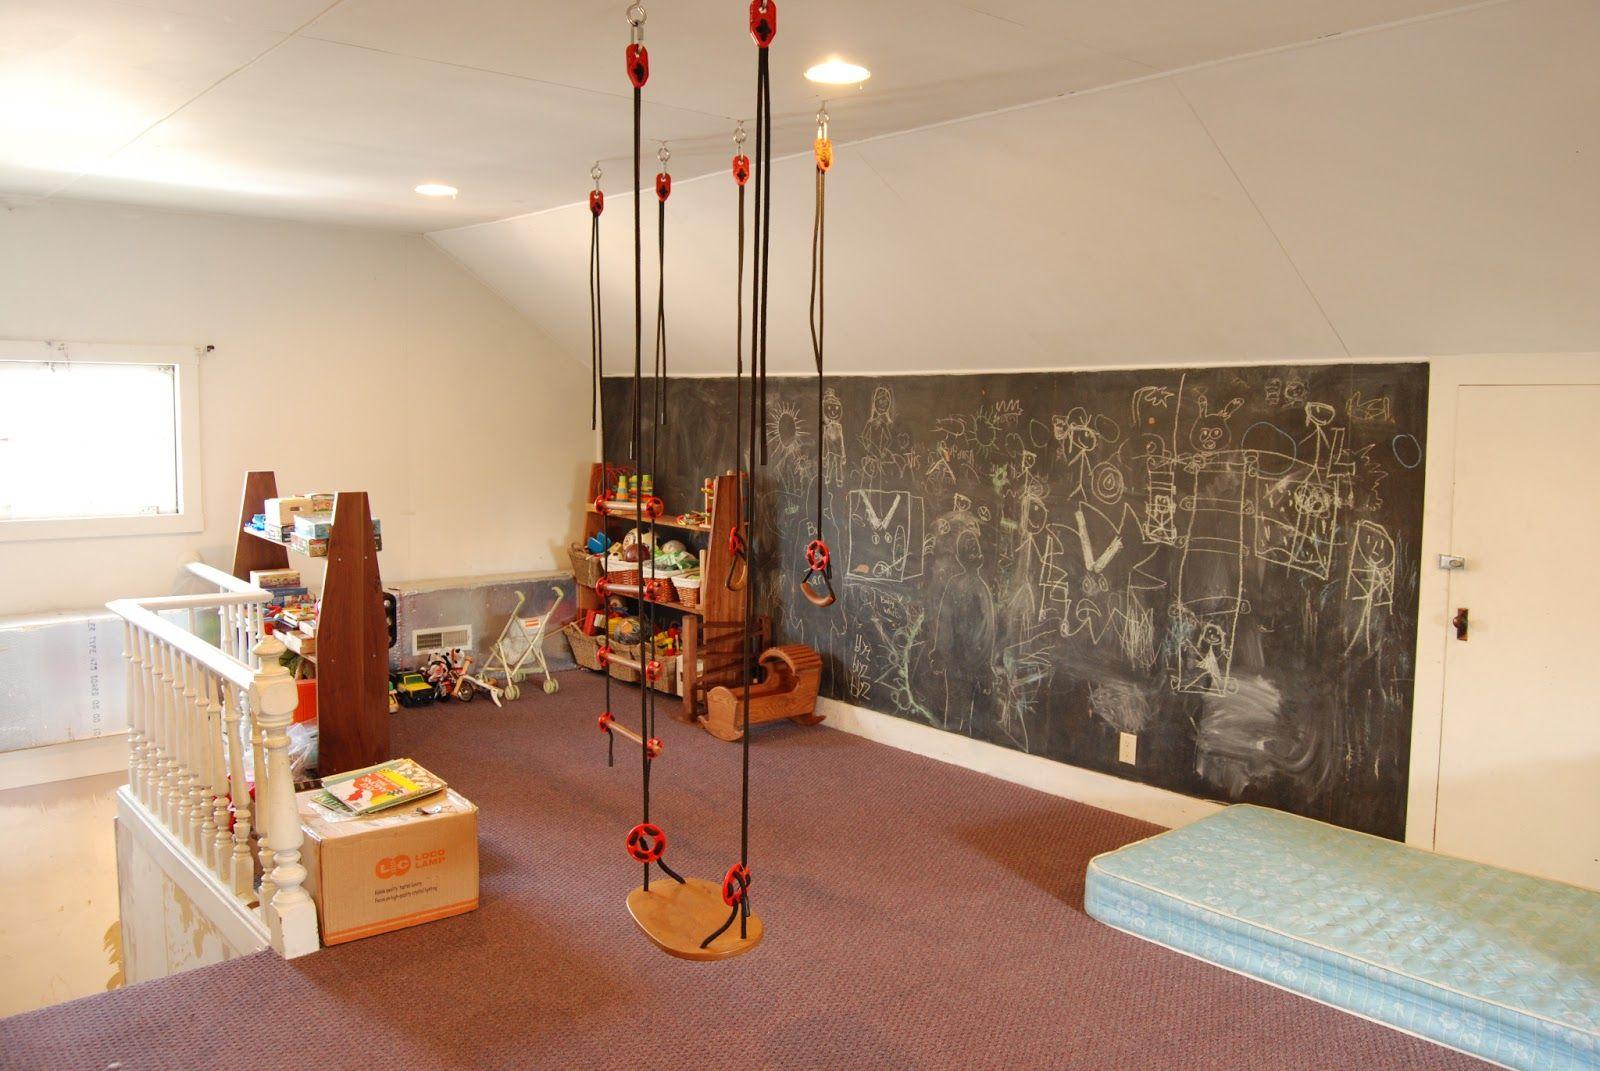 Rumpus room home ideas pinterest attic rooms attic and mattress